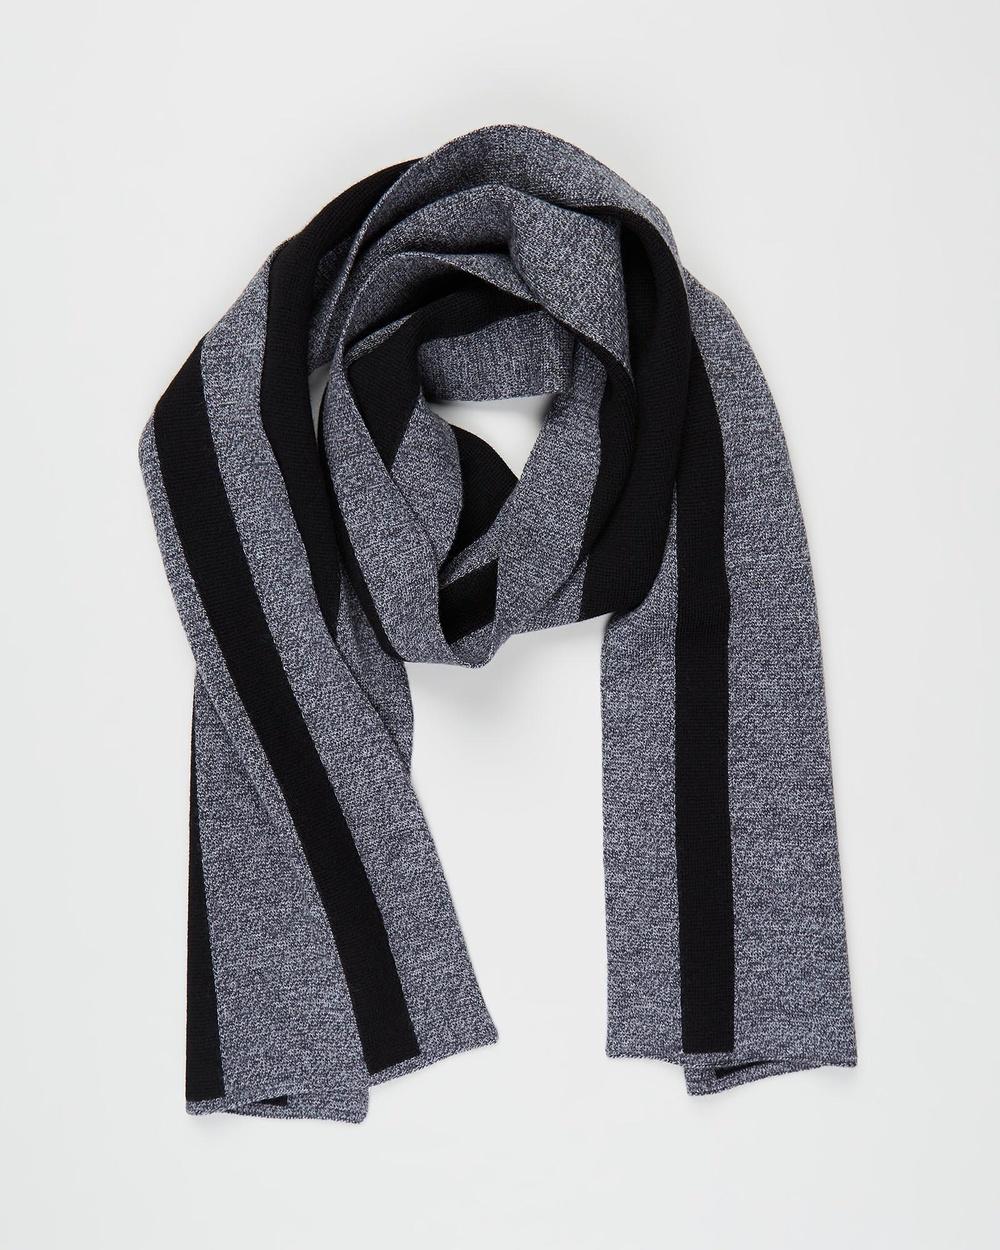 Kent and Curwen Striped Scarf Scarves & Gloves Black